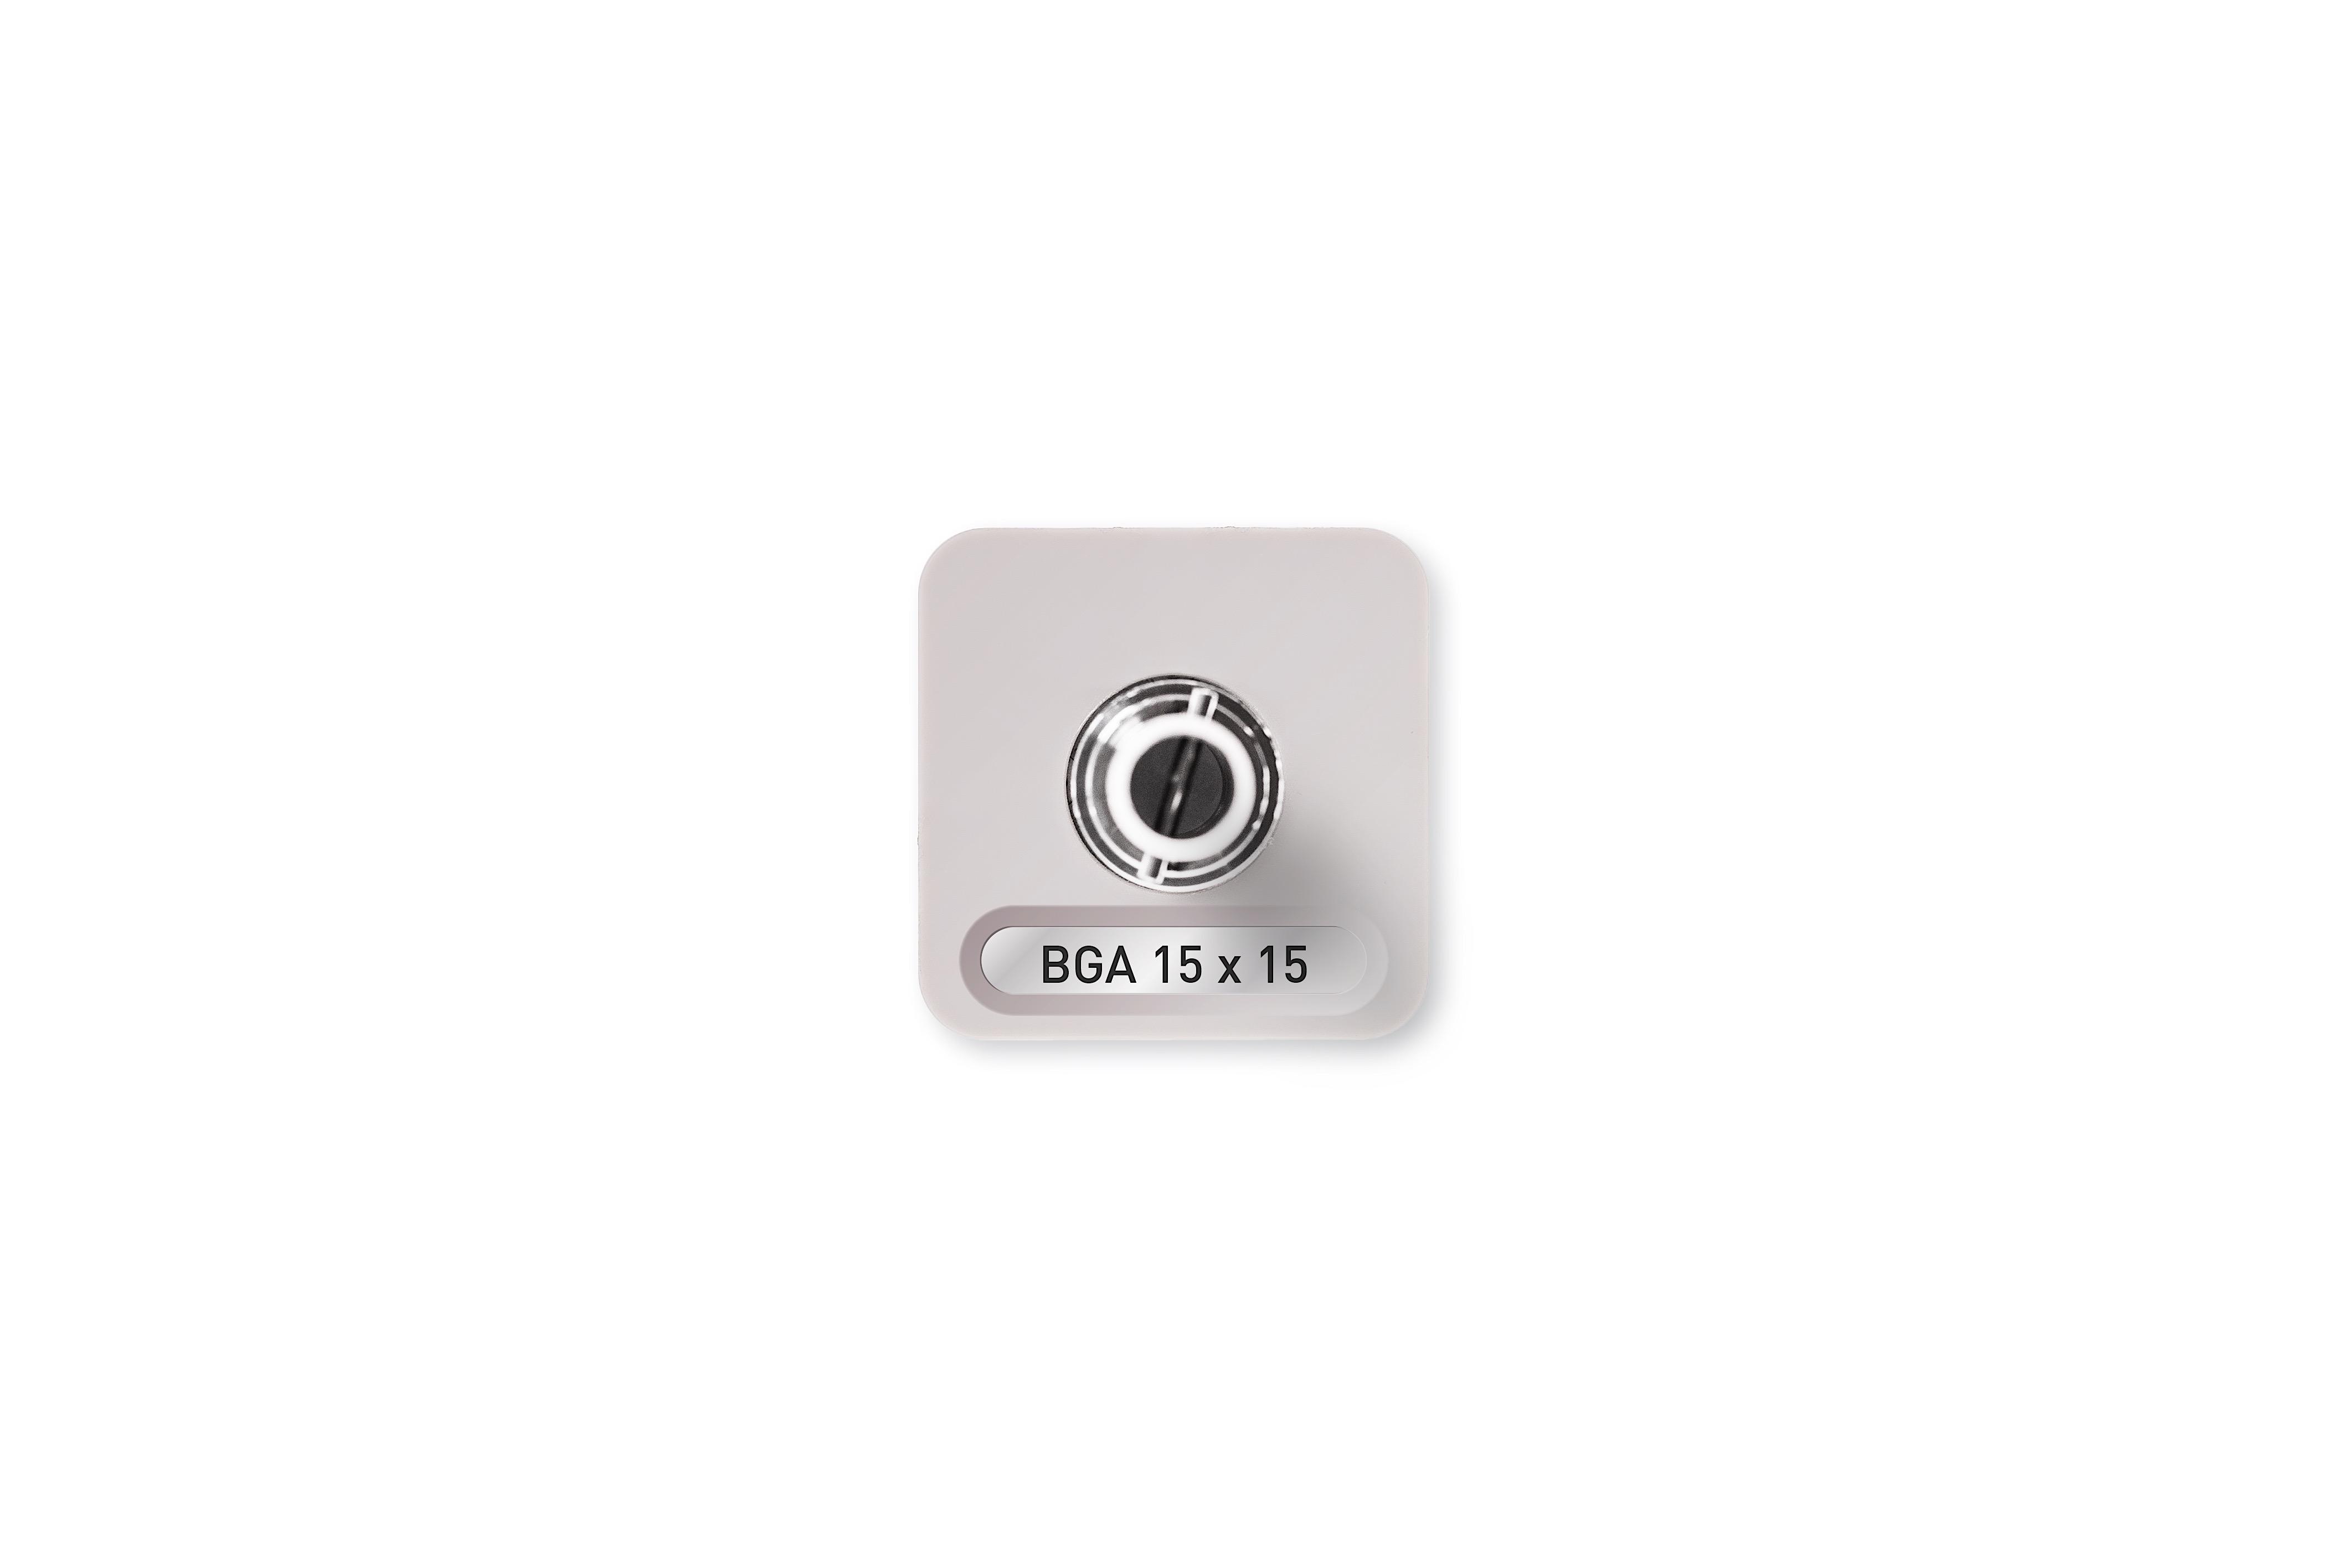 Löt-Werkzeug BGA 15*15mm